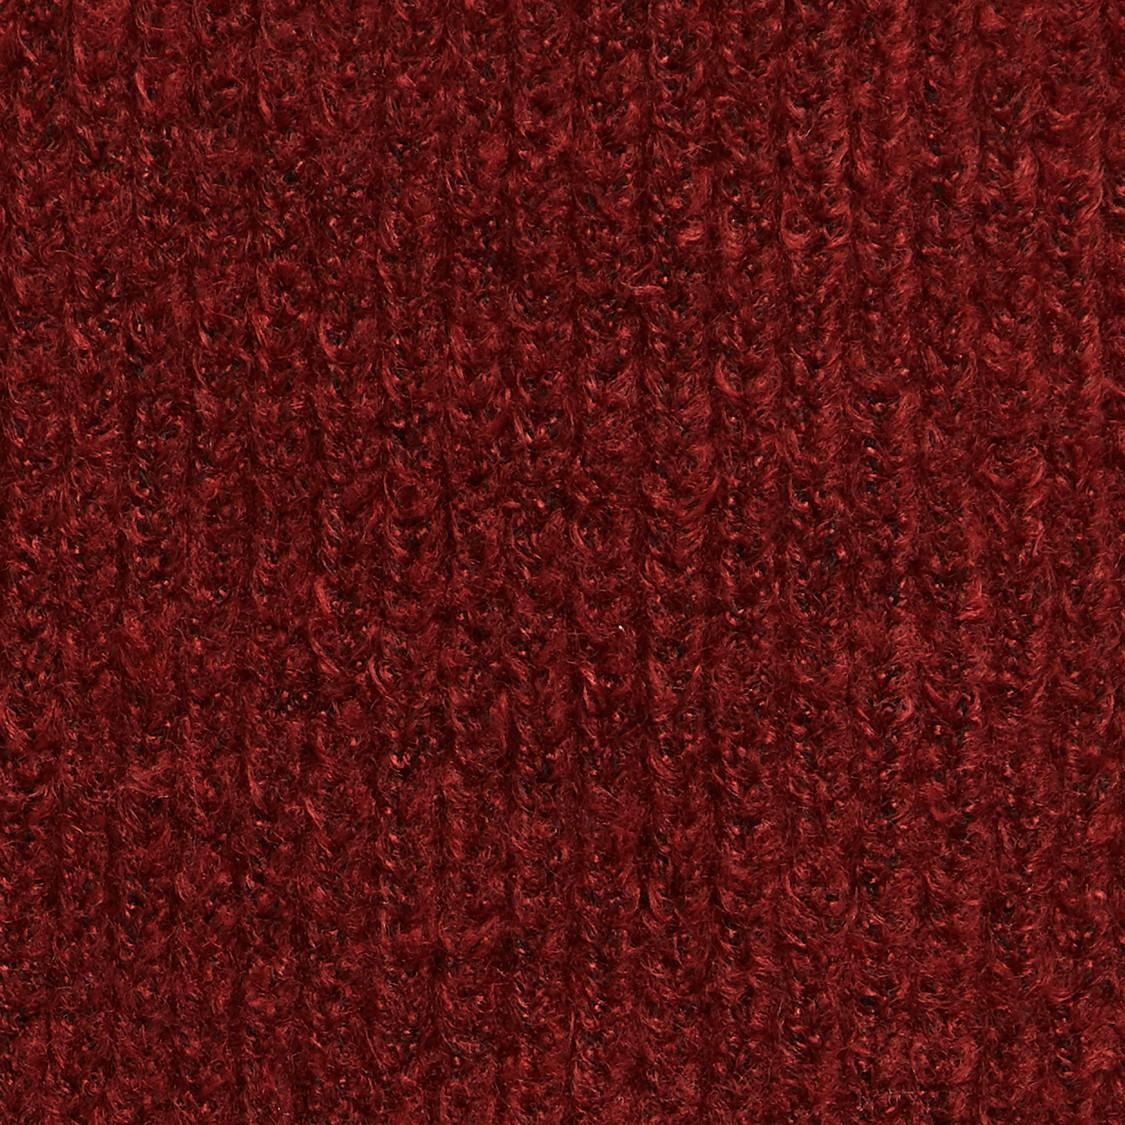 MAX Patterned Knit Muffler